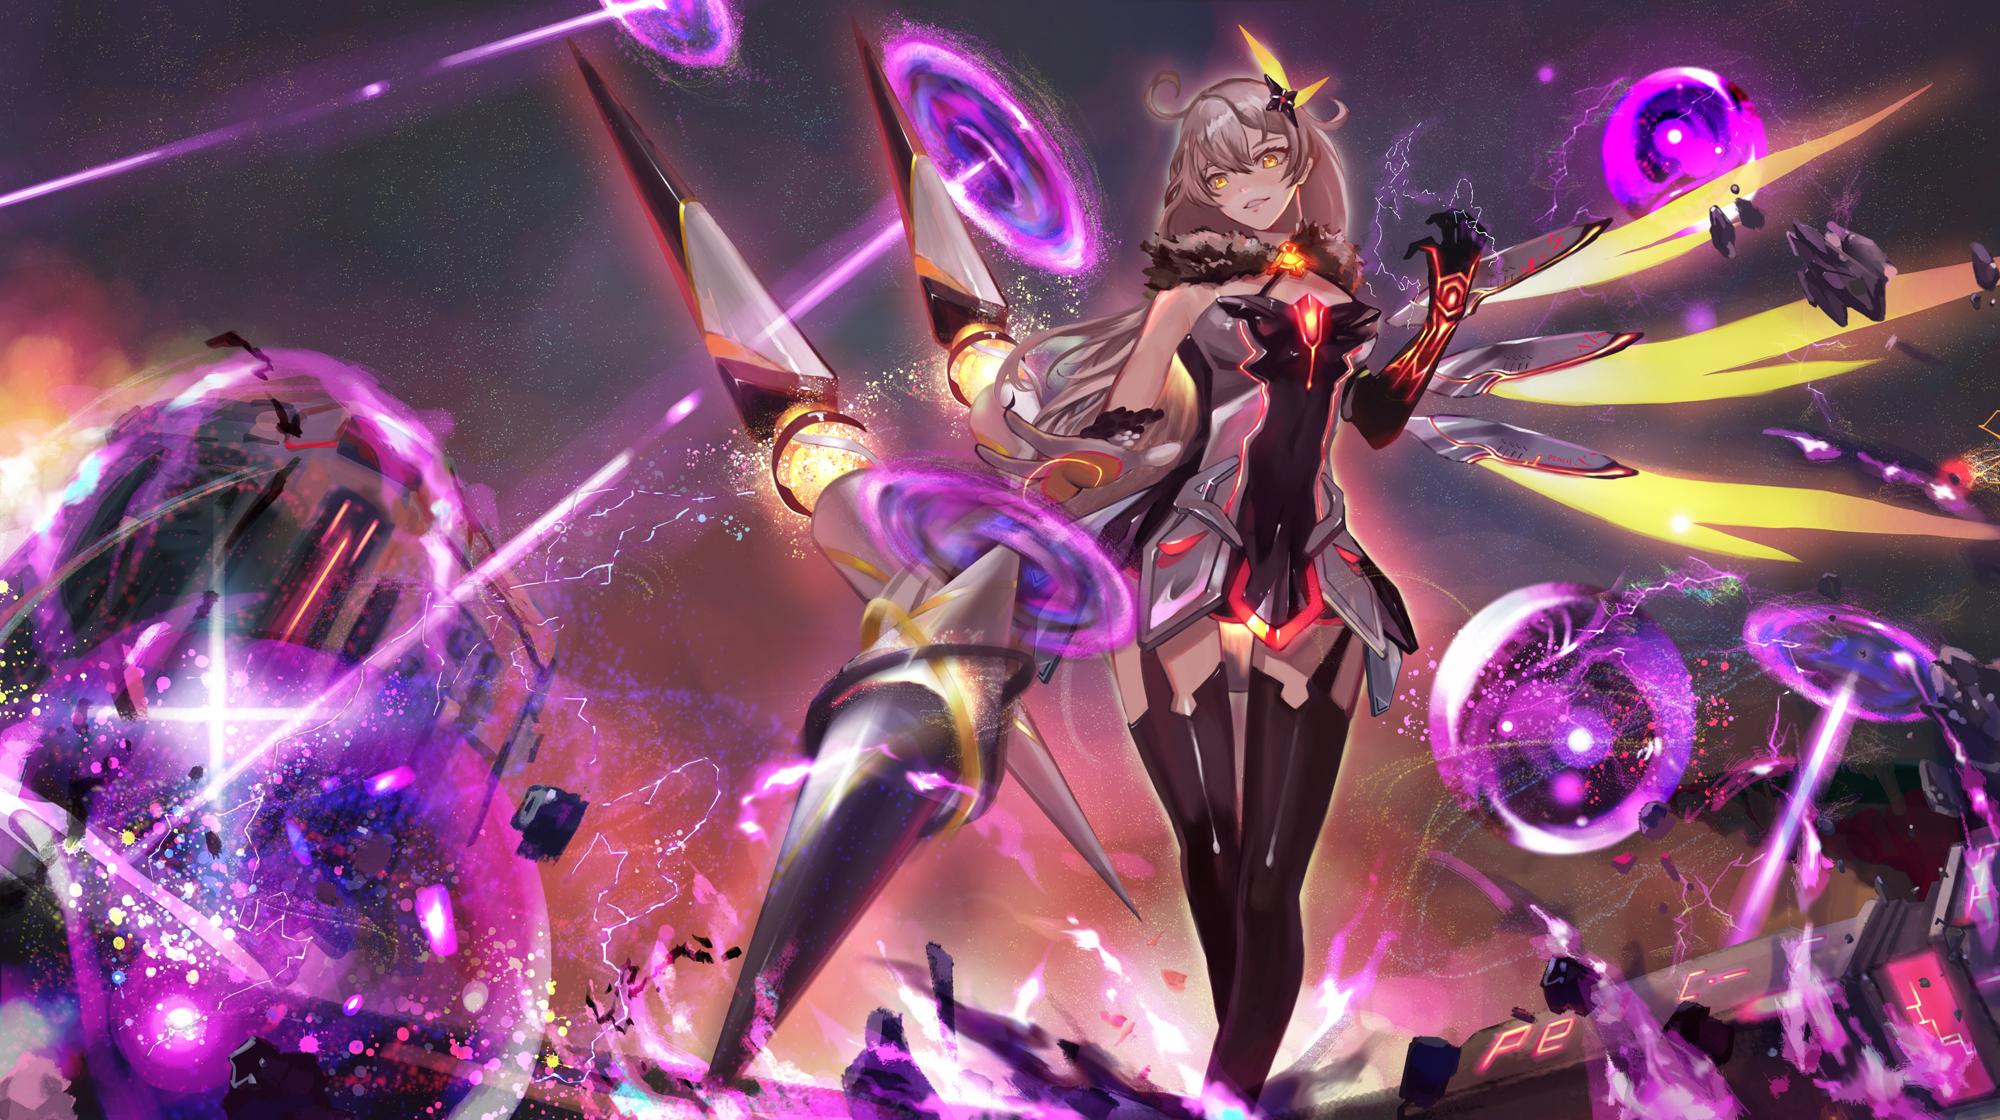 Wallpaper Anime Girls Honkai Impact 2000x1120